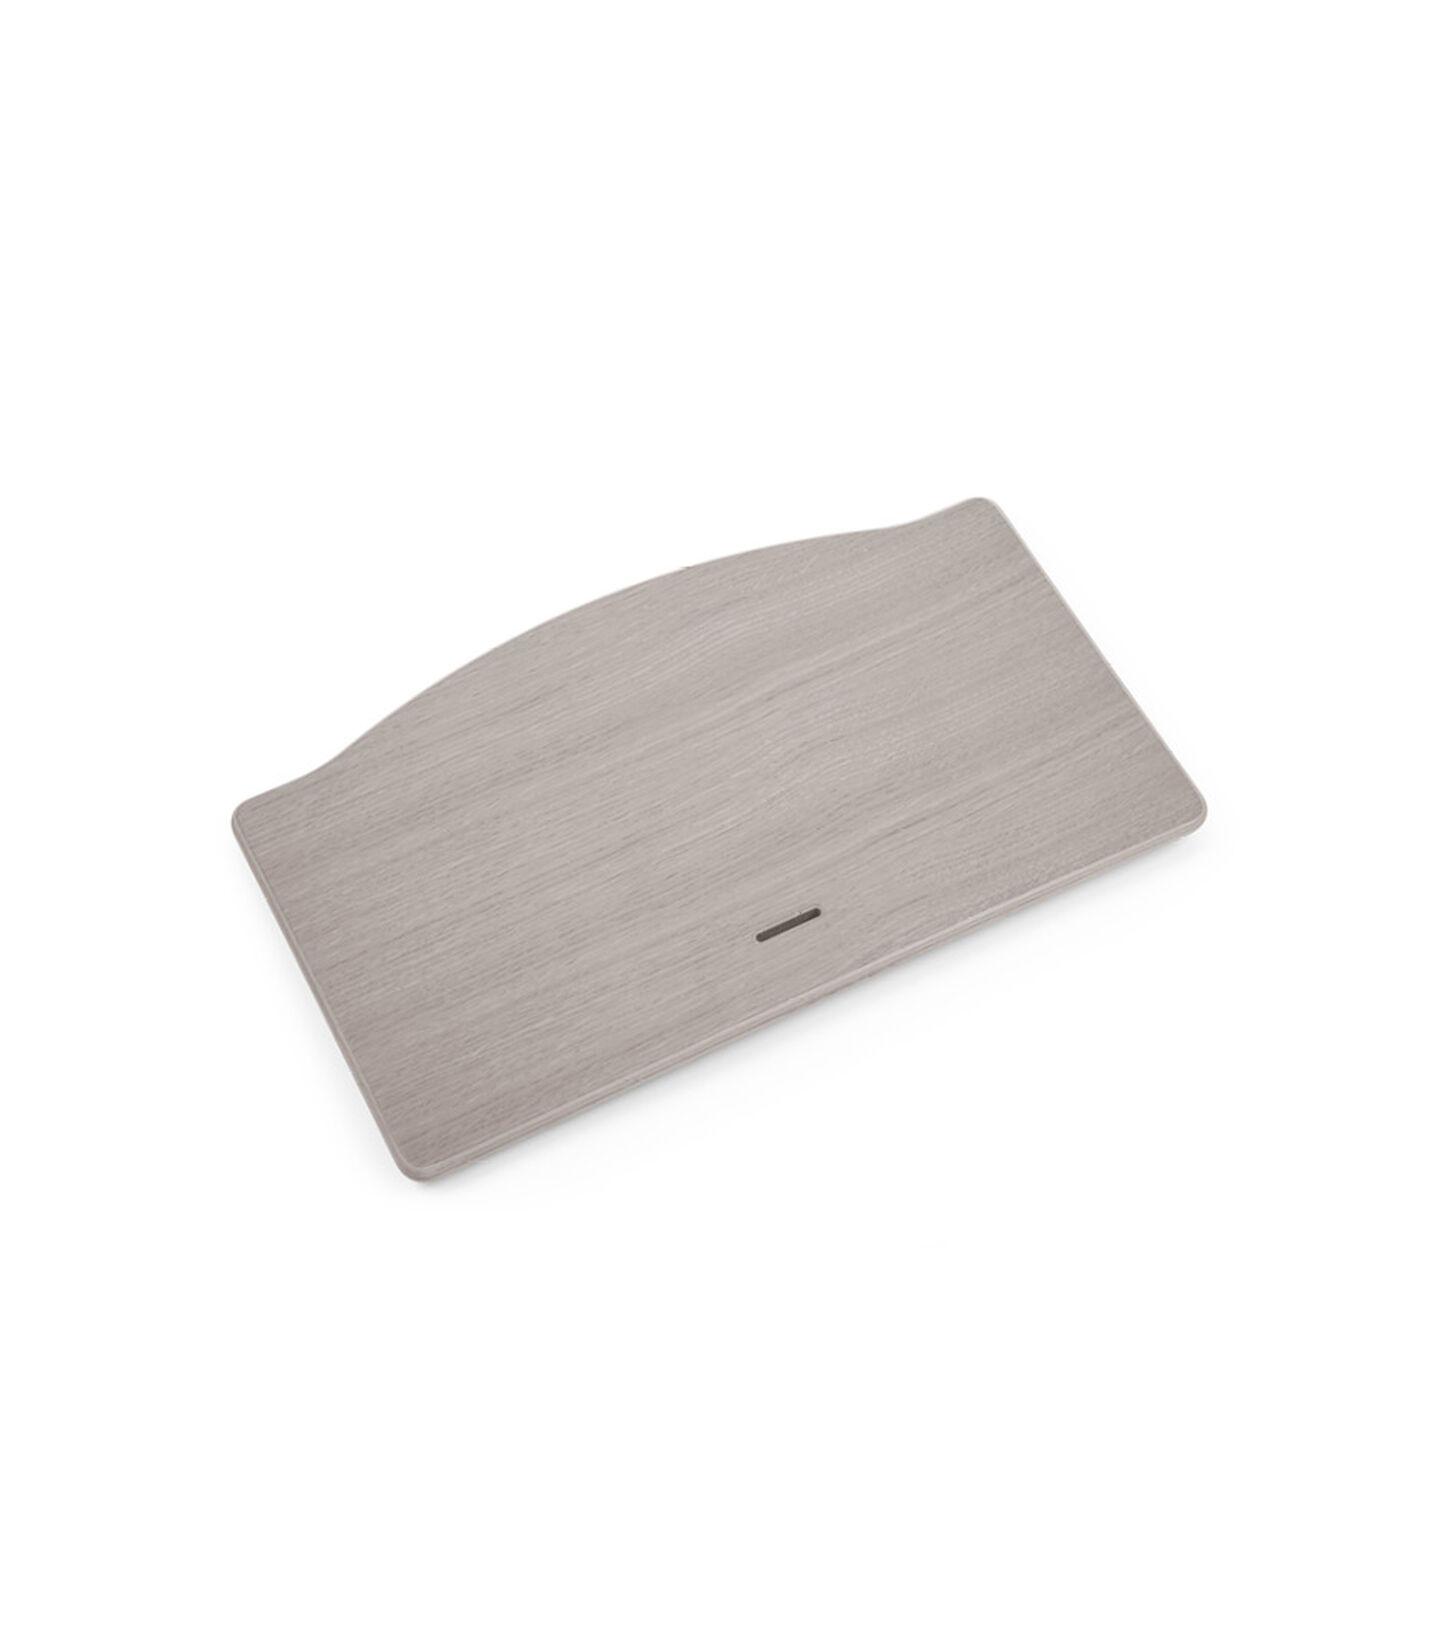 Tripp Trapp® Seatplate Oak Greywash, Oak Greywash, mainview view 1